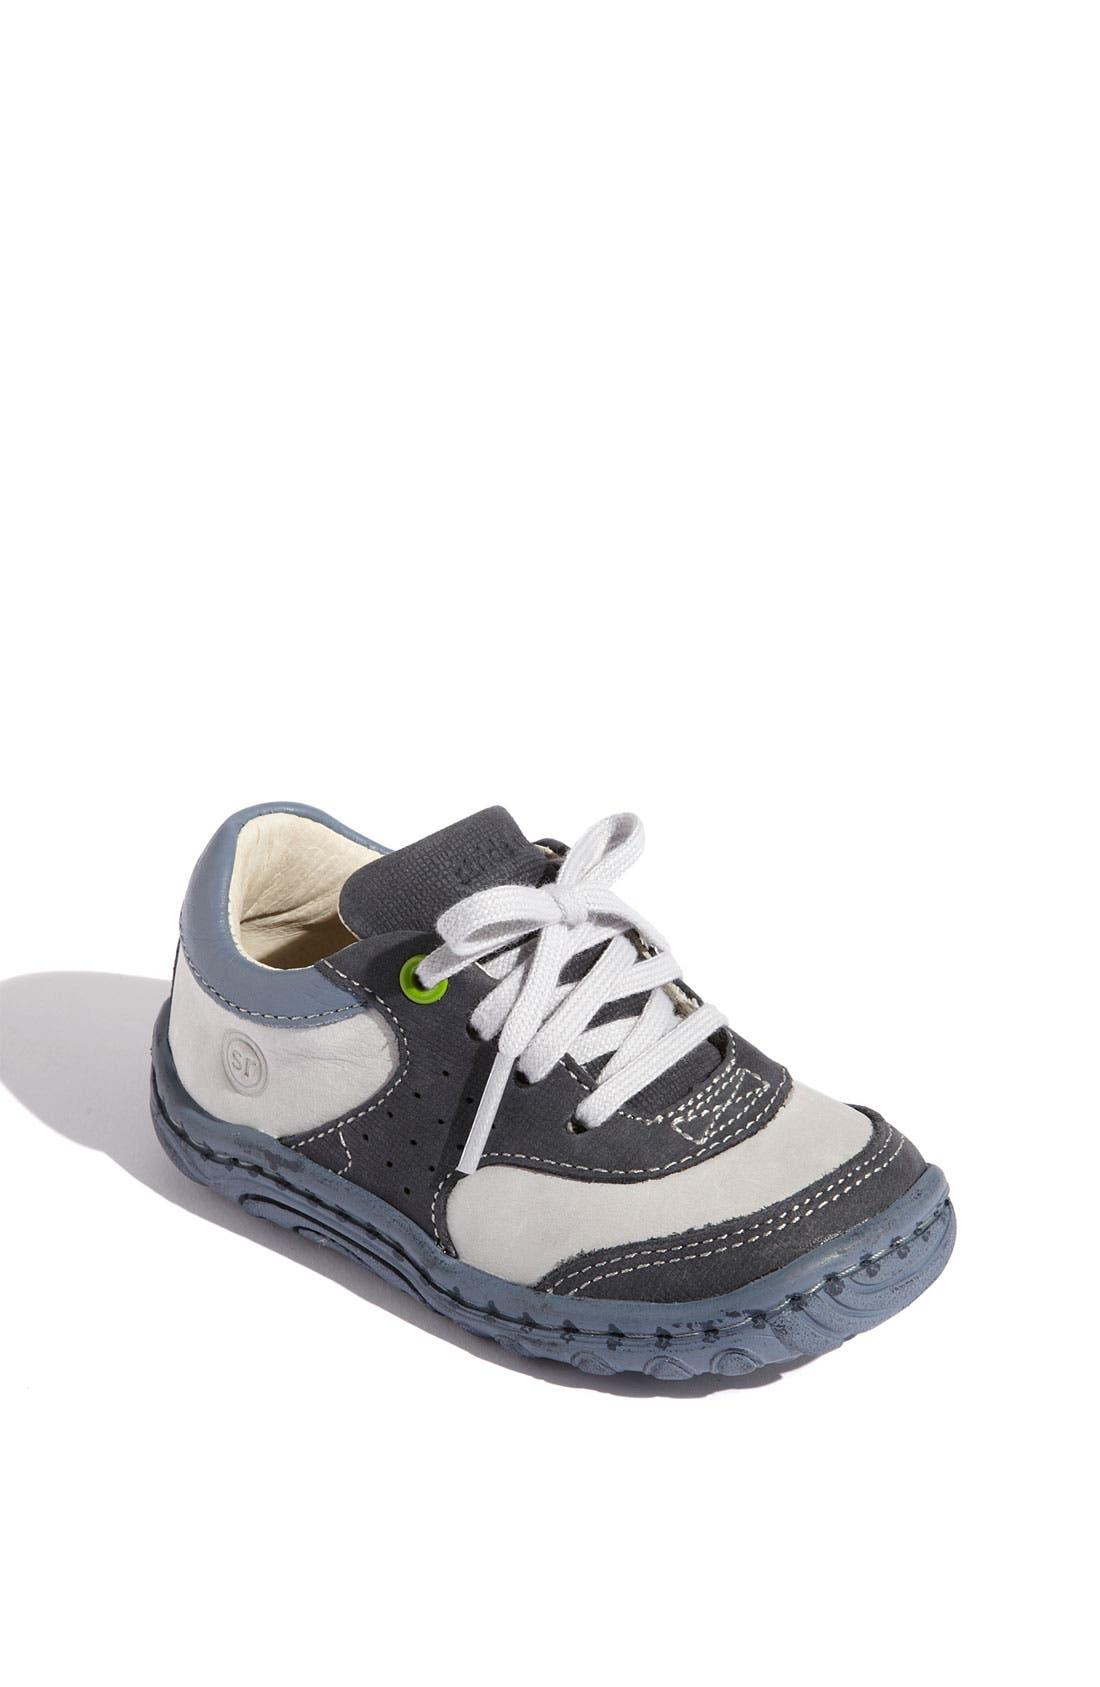 Main Image - Stride Rite 'Charles' Sneaker (Baby, Walker & Toddler)